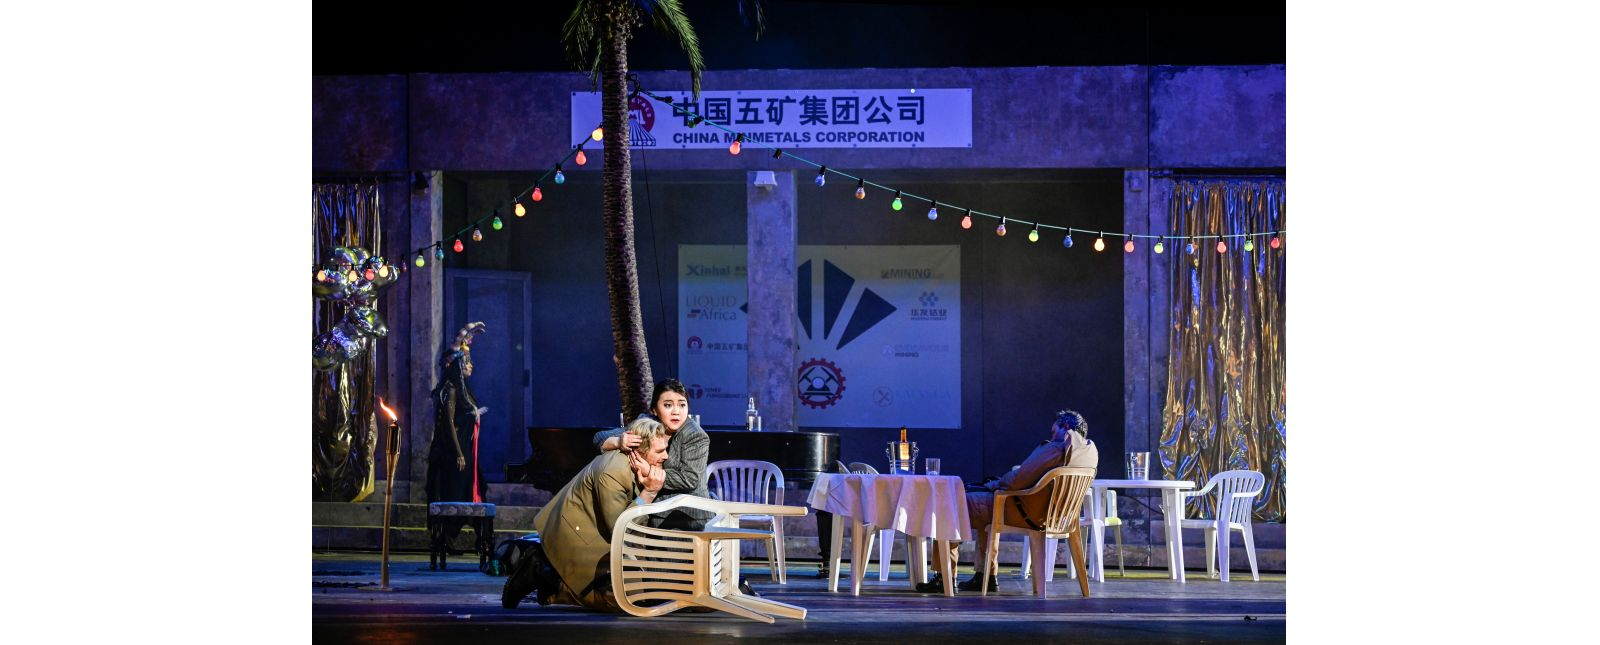 HULDA // Morenike Fadayomi // Joshua Kohl // Irina Jae Eun Park // Opernchor // 2019 // Tanja Dorendorf // T+T Fotografie